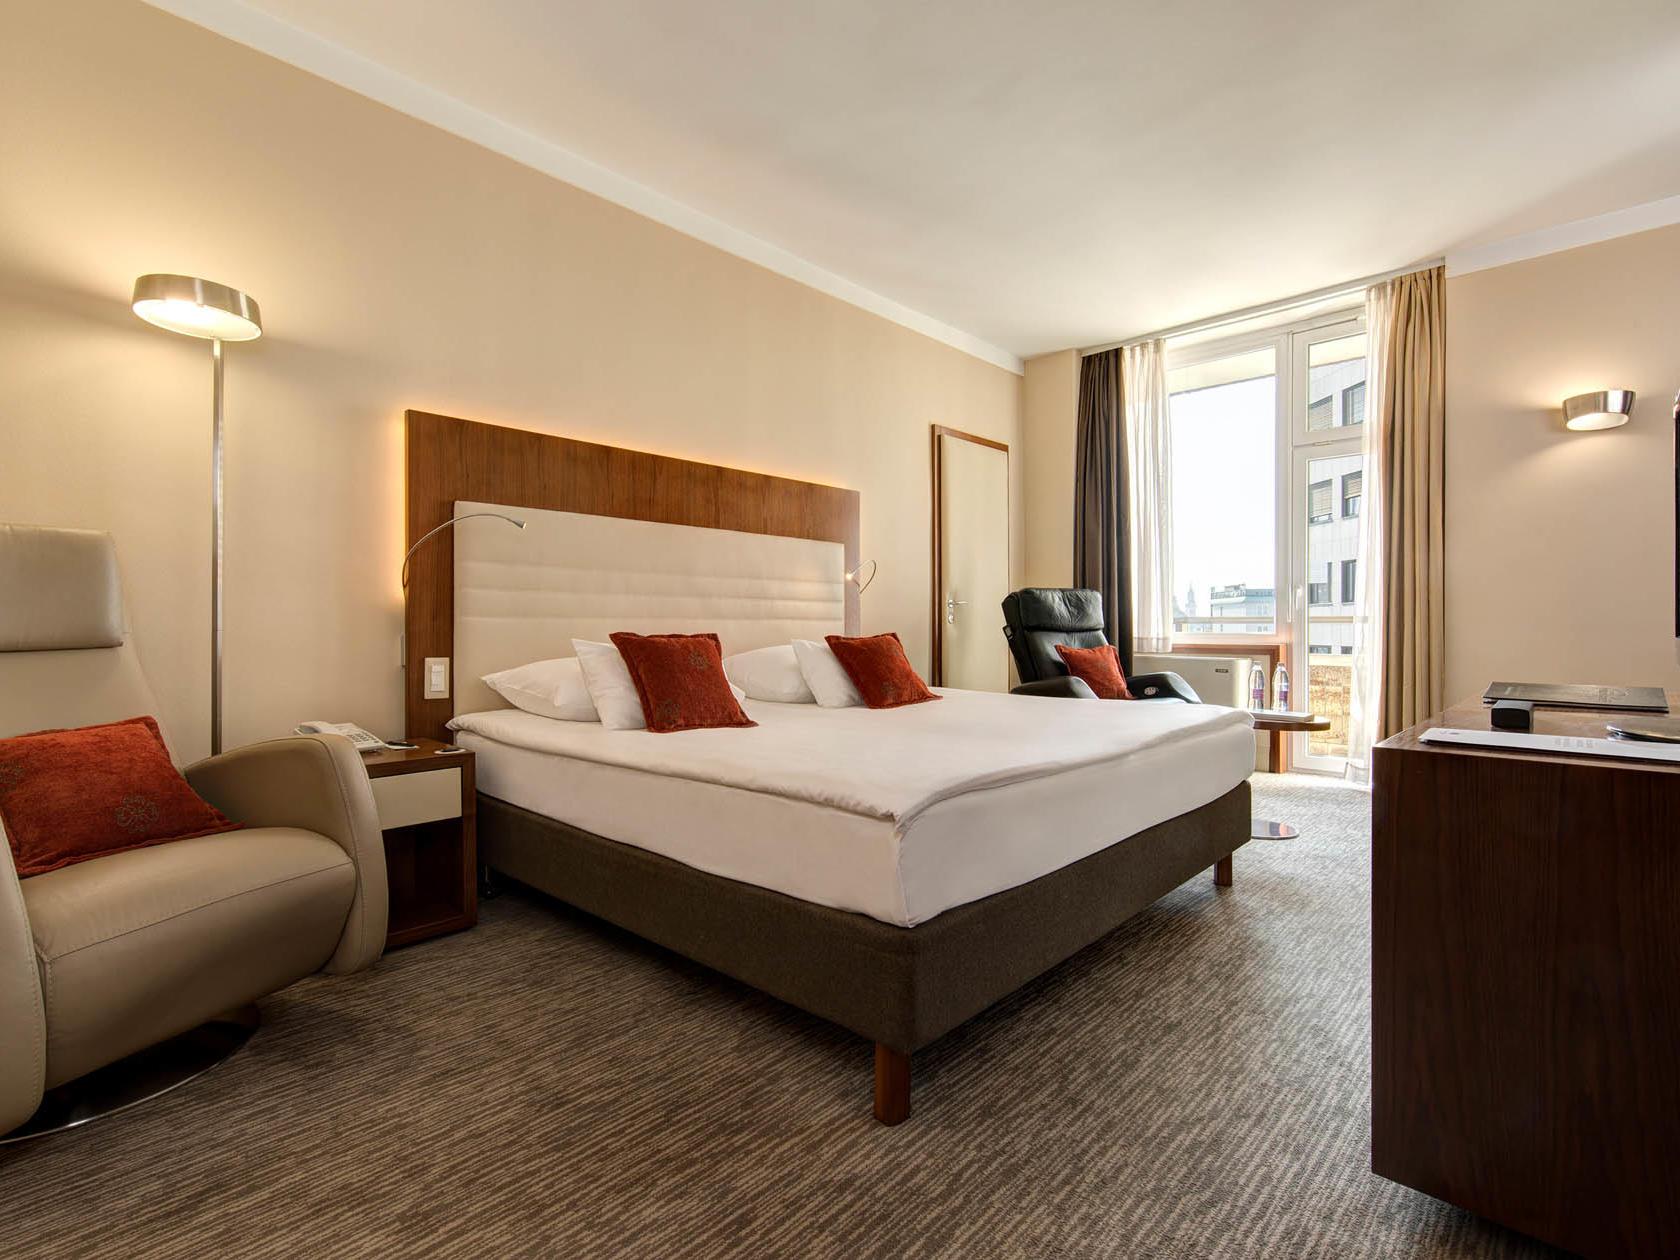 Executive One Bedroom Suite at uHotel in Ljubljana